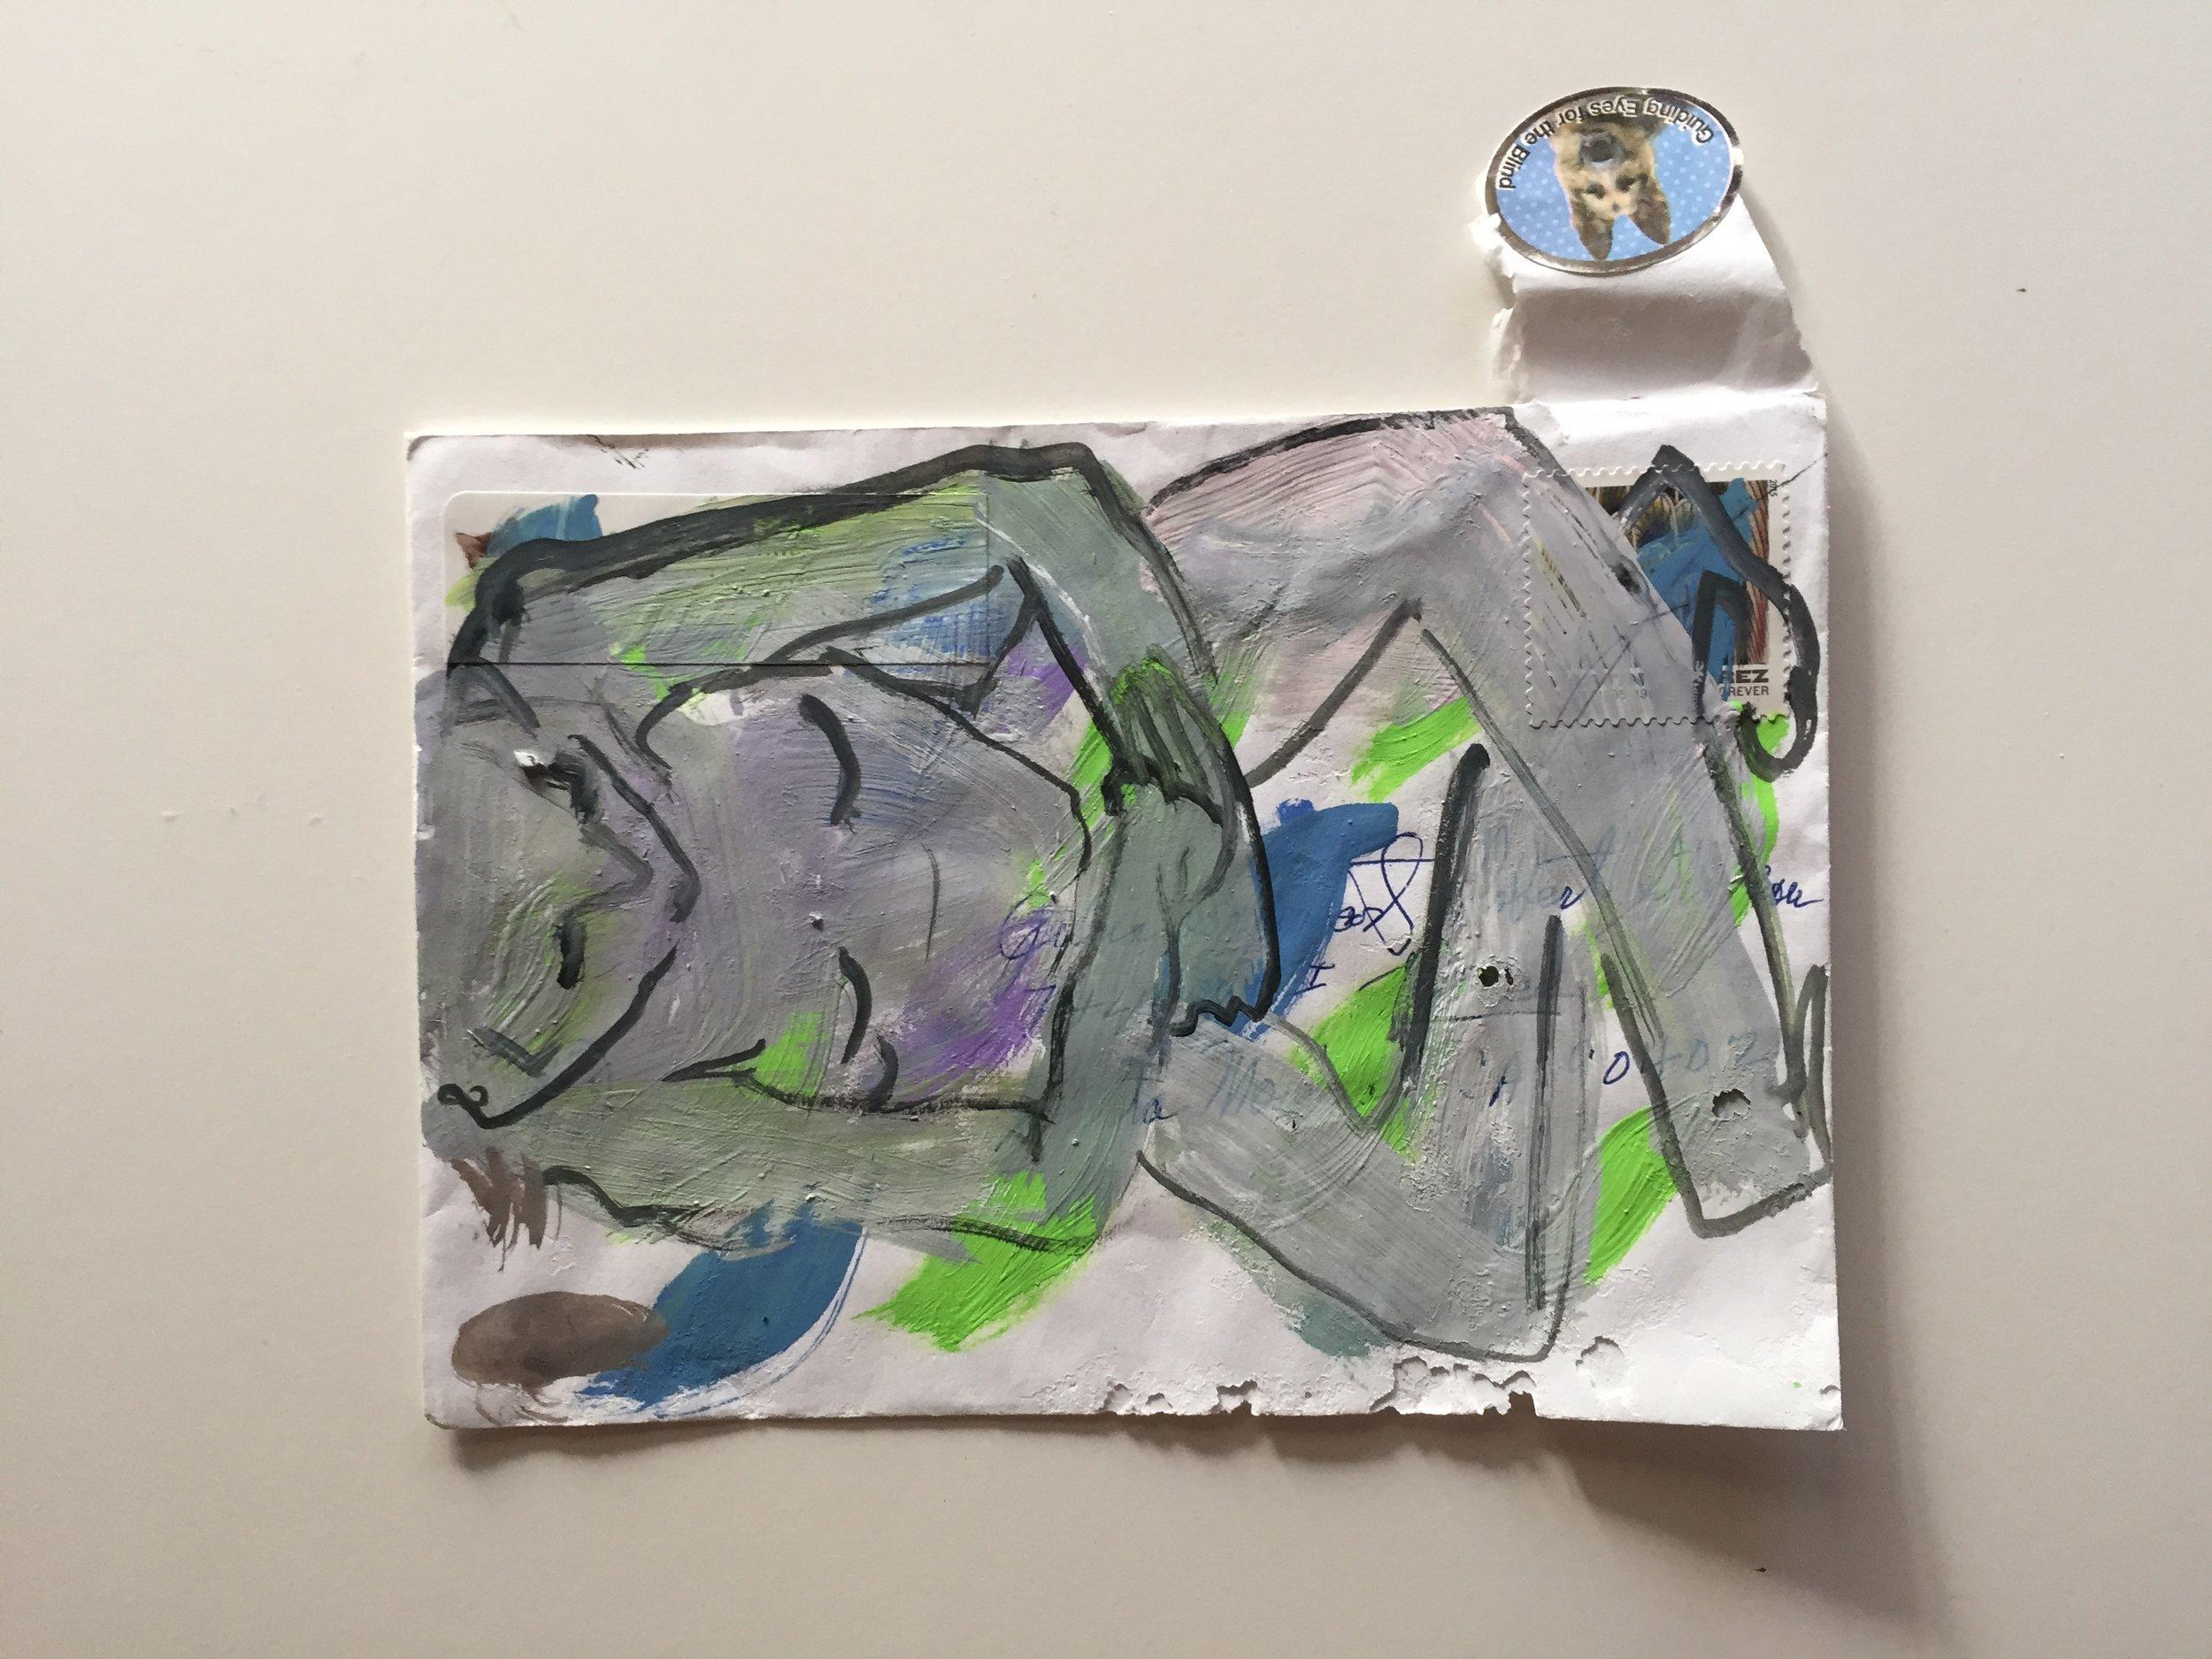 seated figure 2018 gouache on envelope